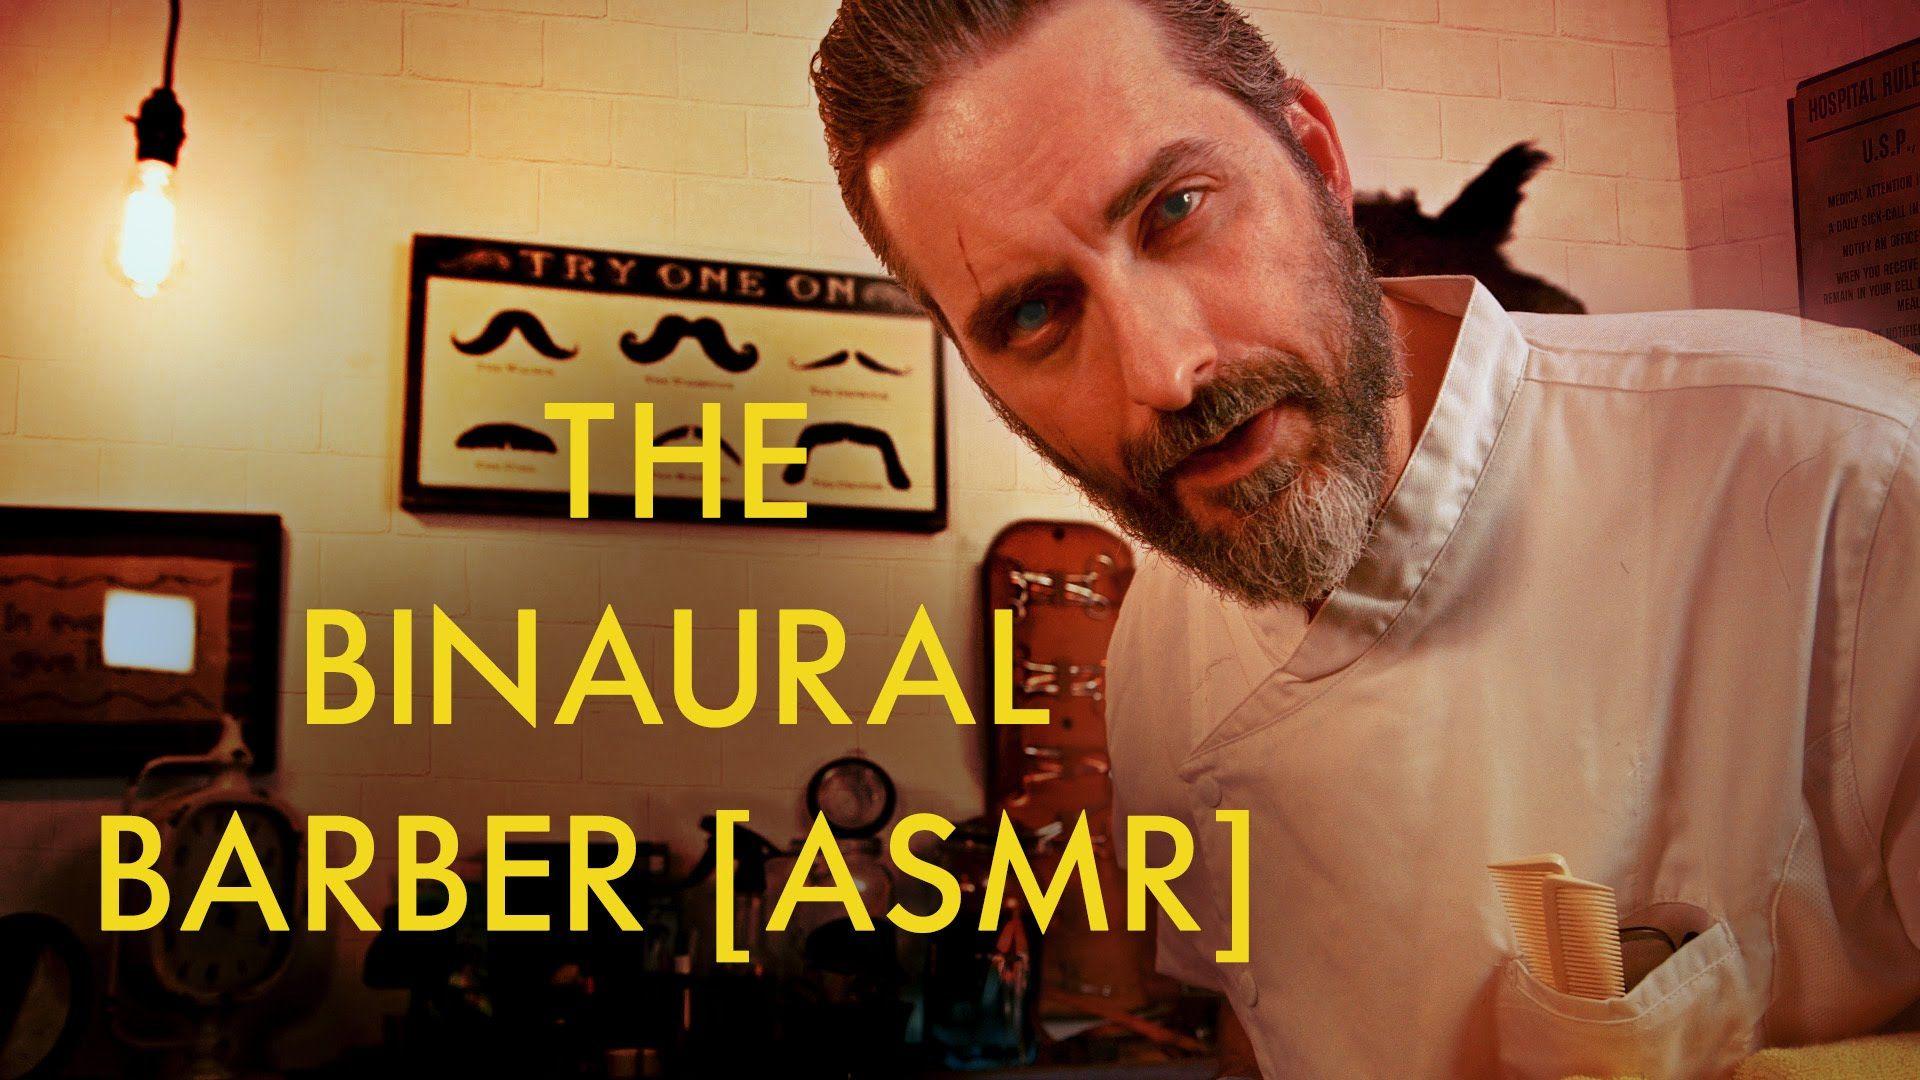 How often do men get haircuts the binaural barber asmr  СσuaФŕŦåЂζЧ  pinterest